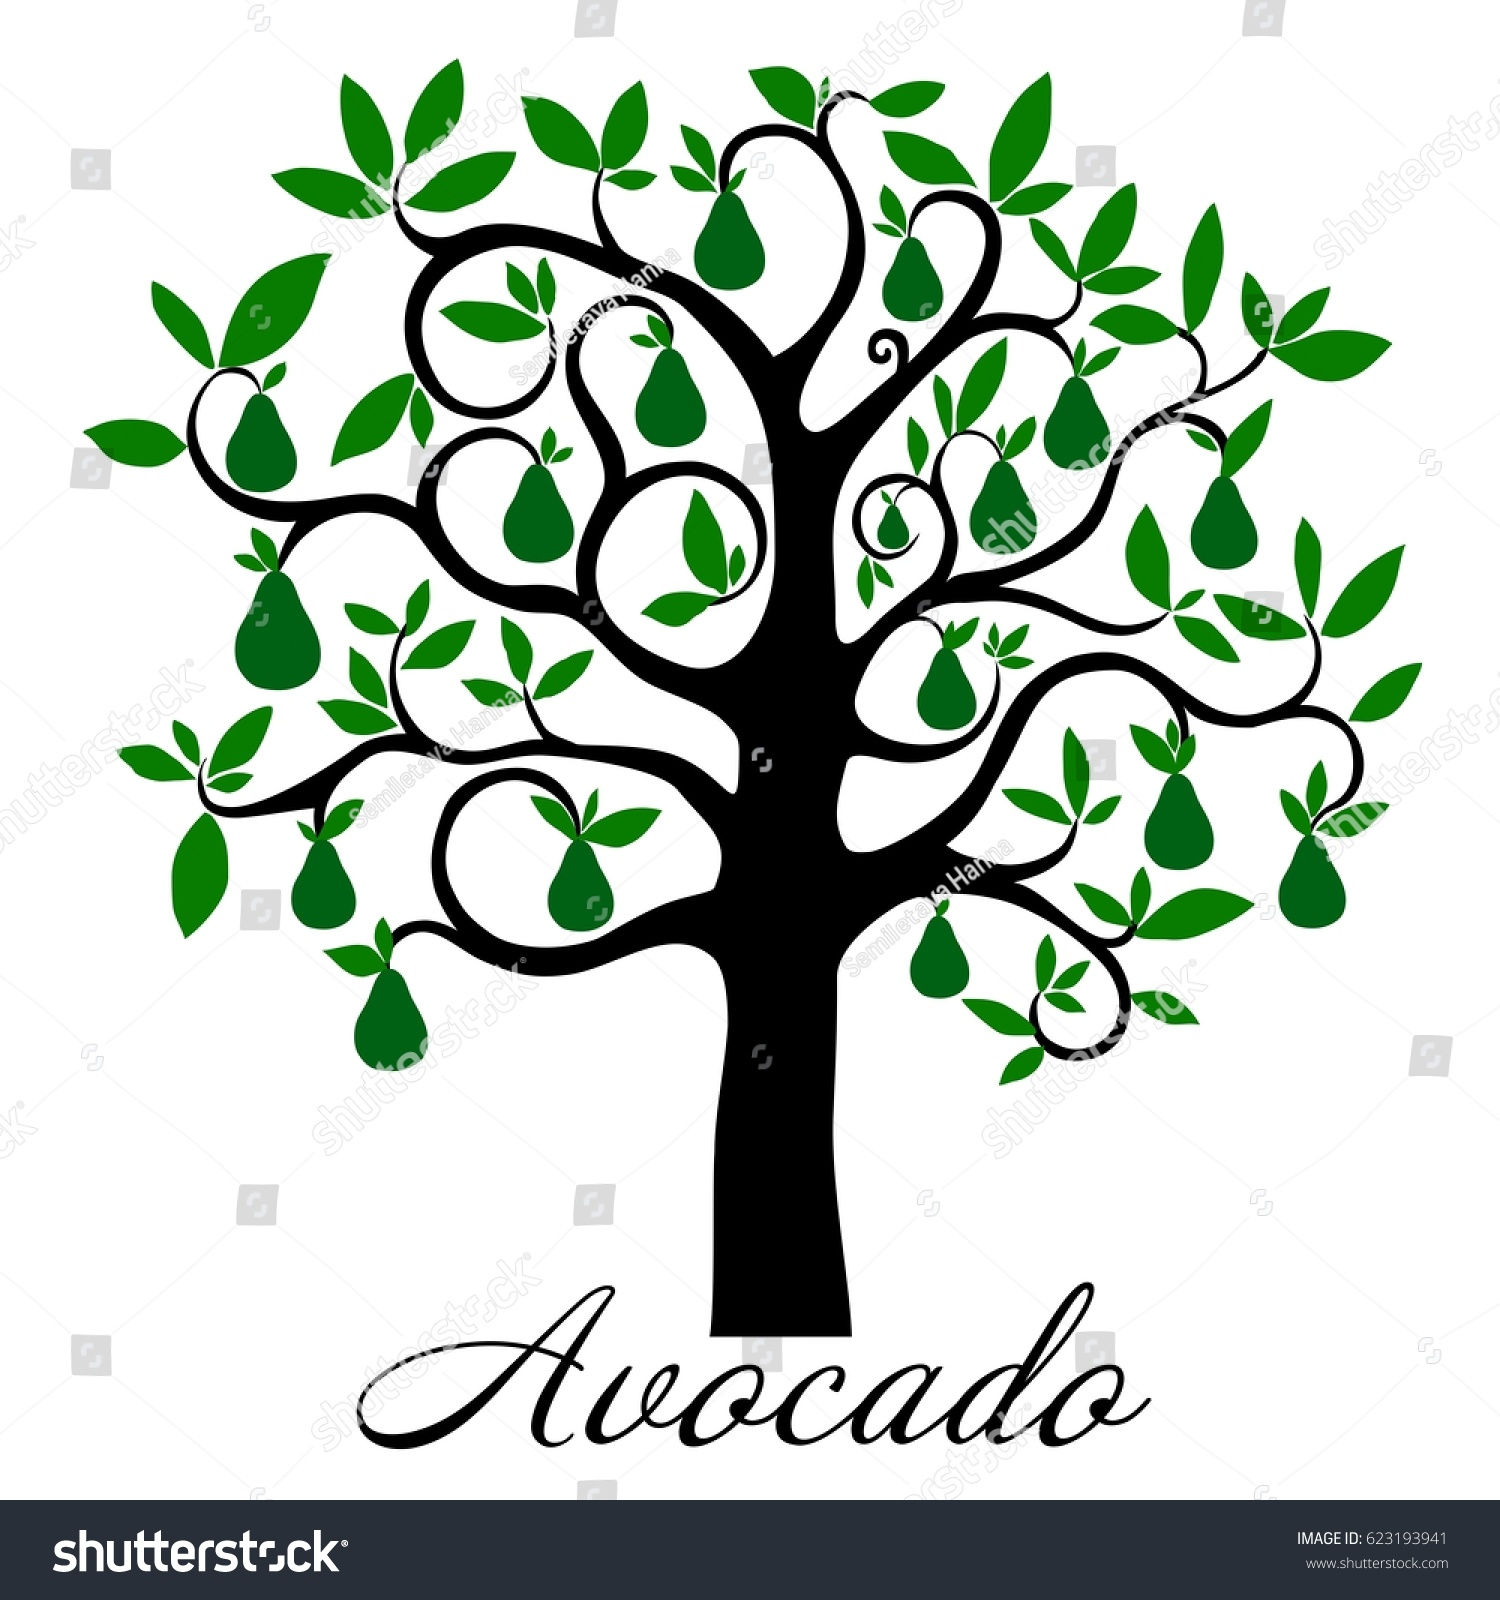 Station . Avocado clipart avocado tree